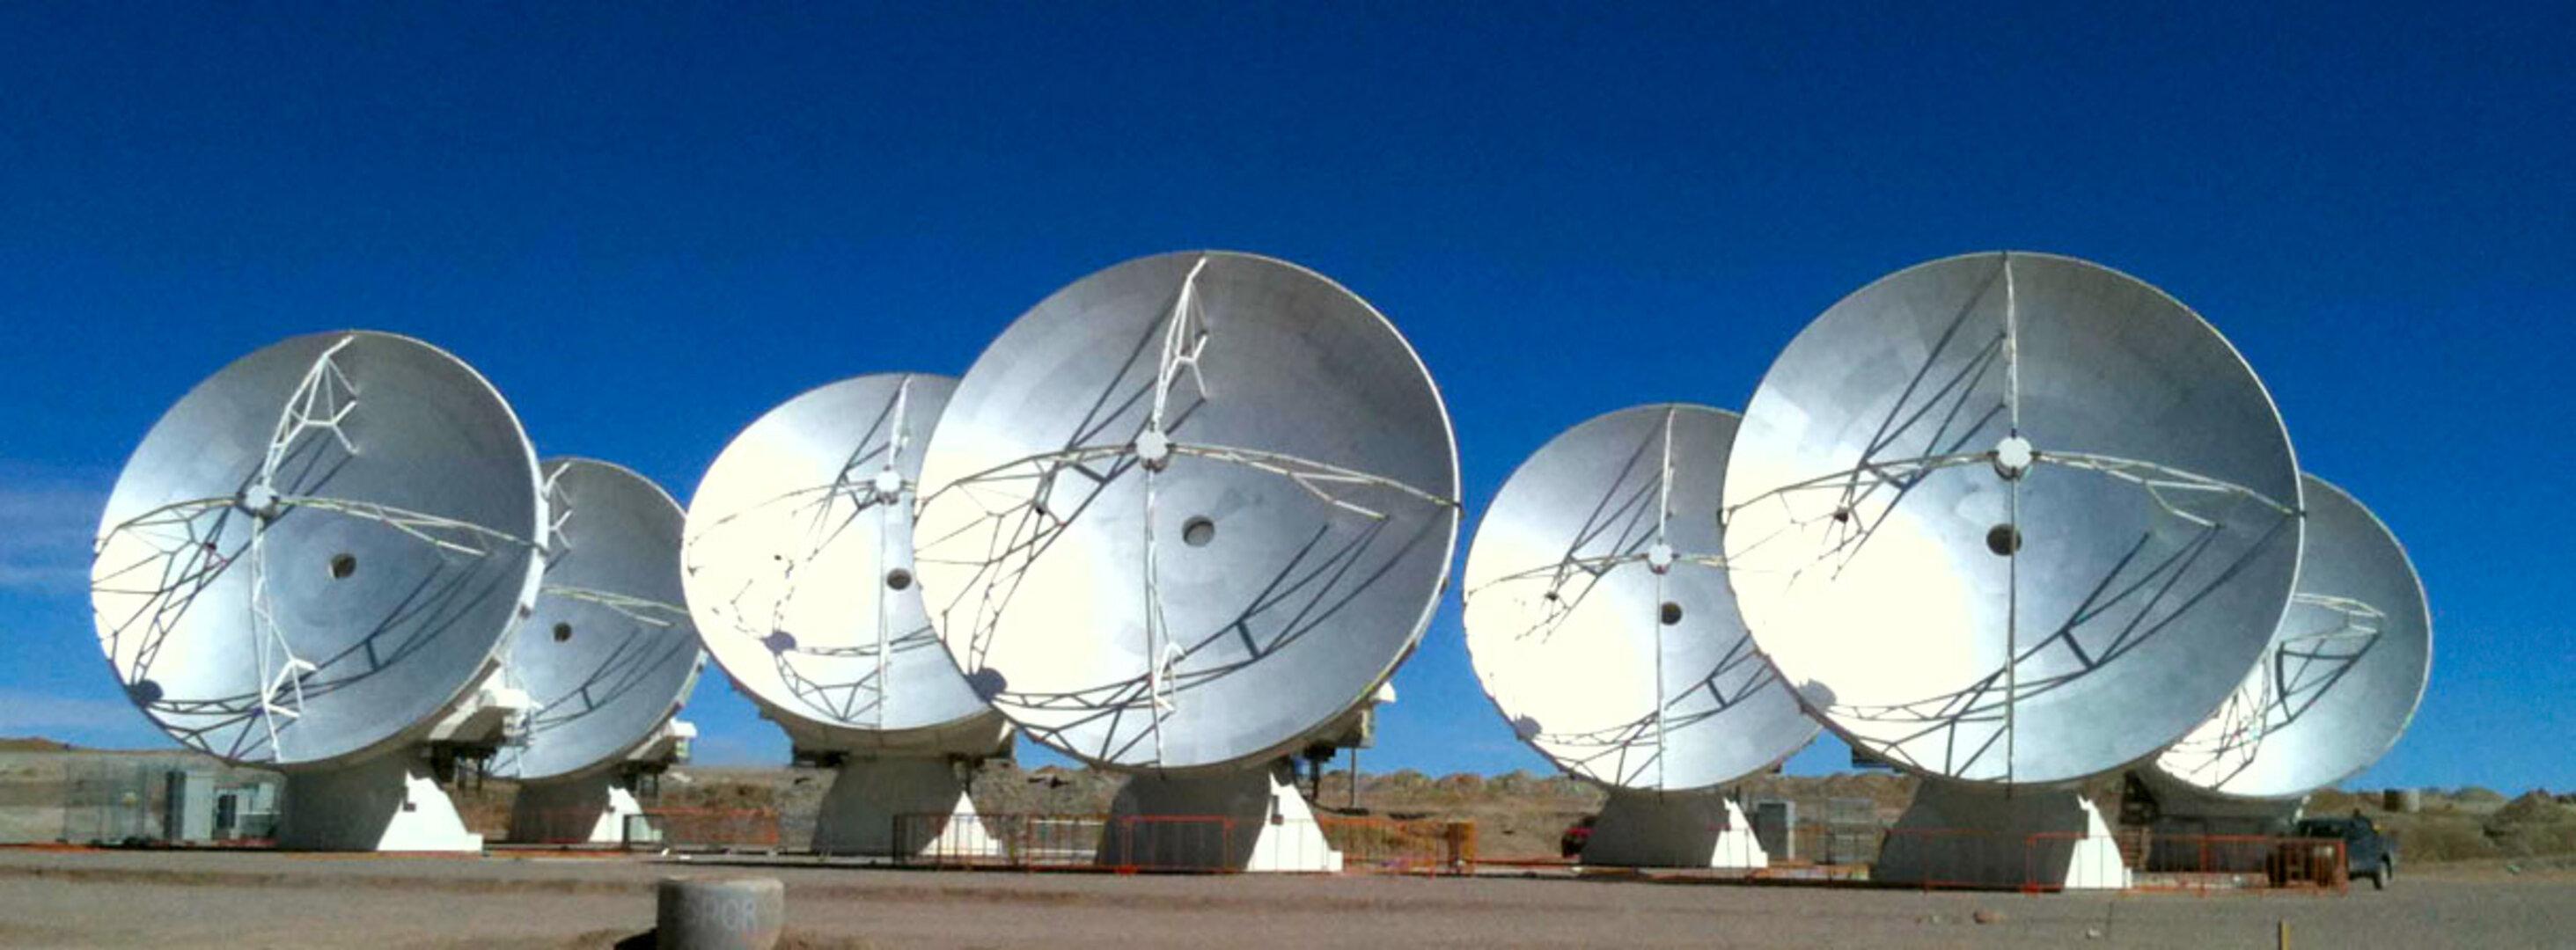 alma_radio_telescope_pillars.jpg